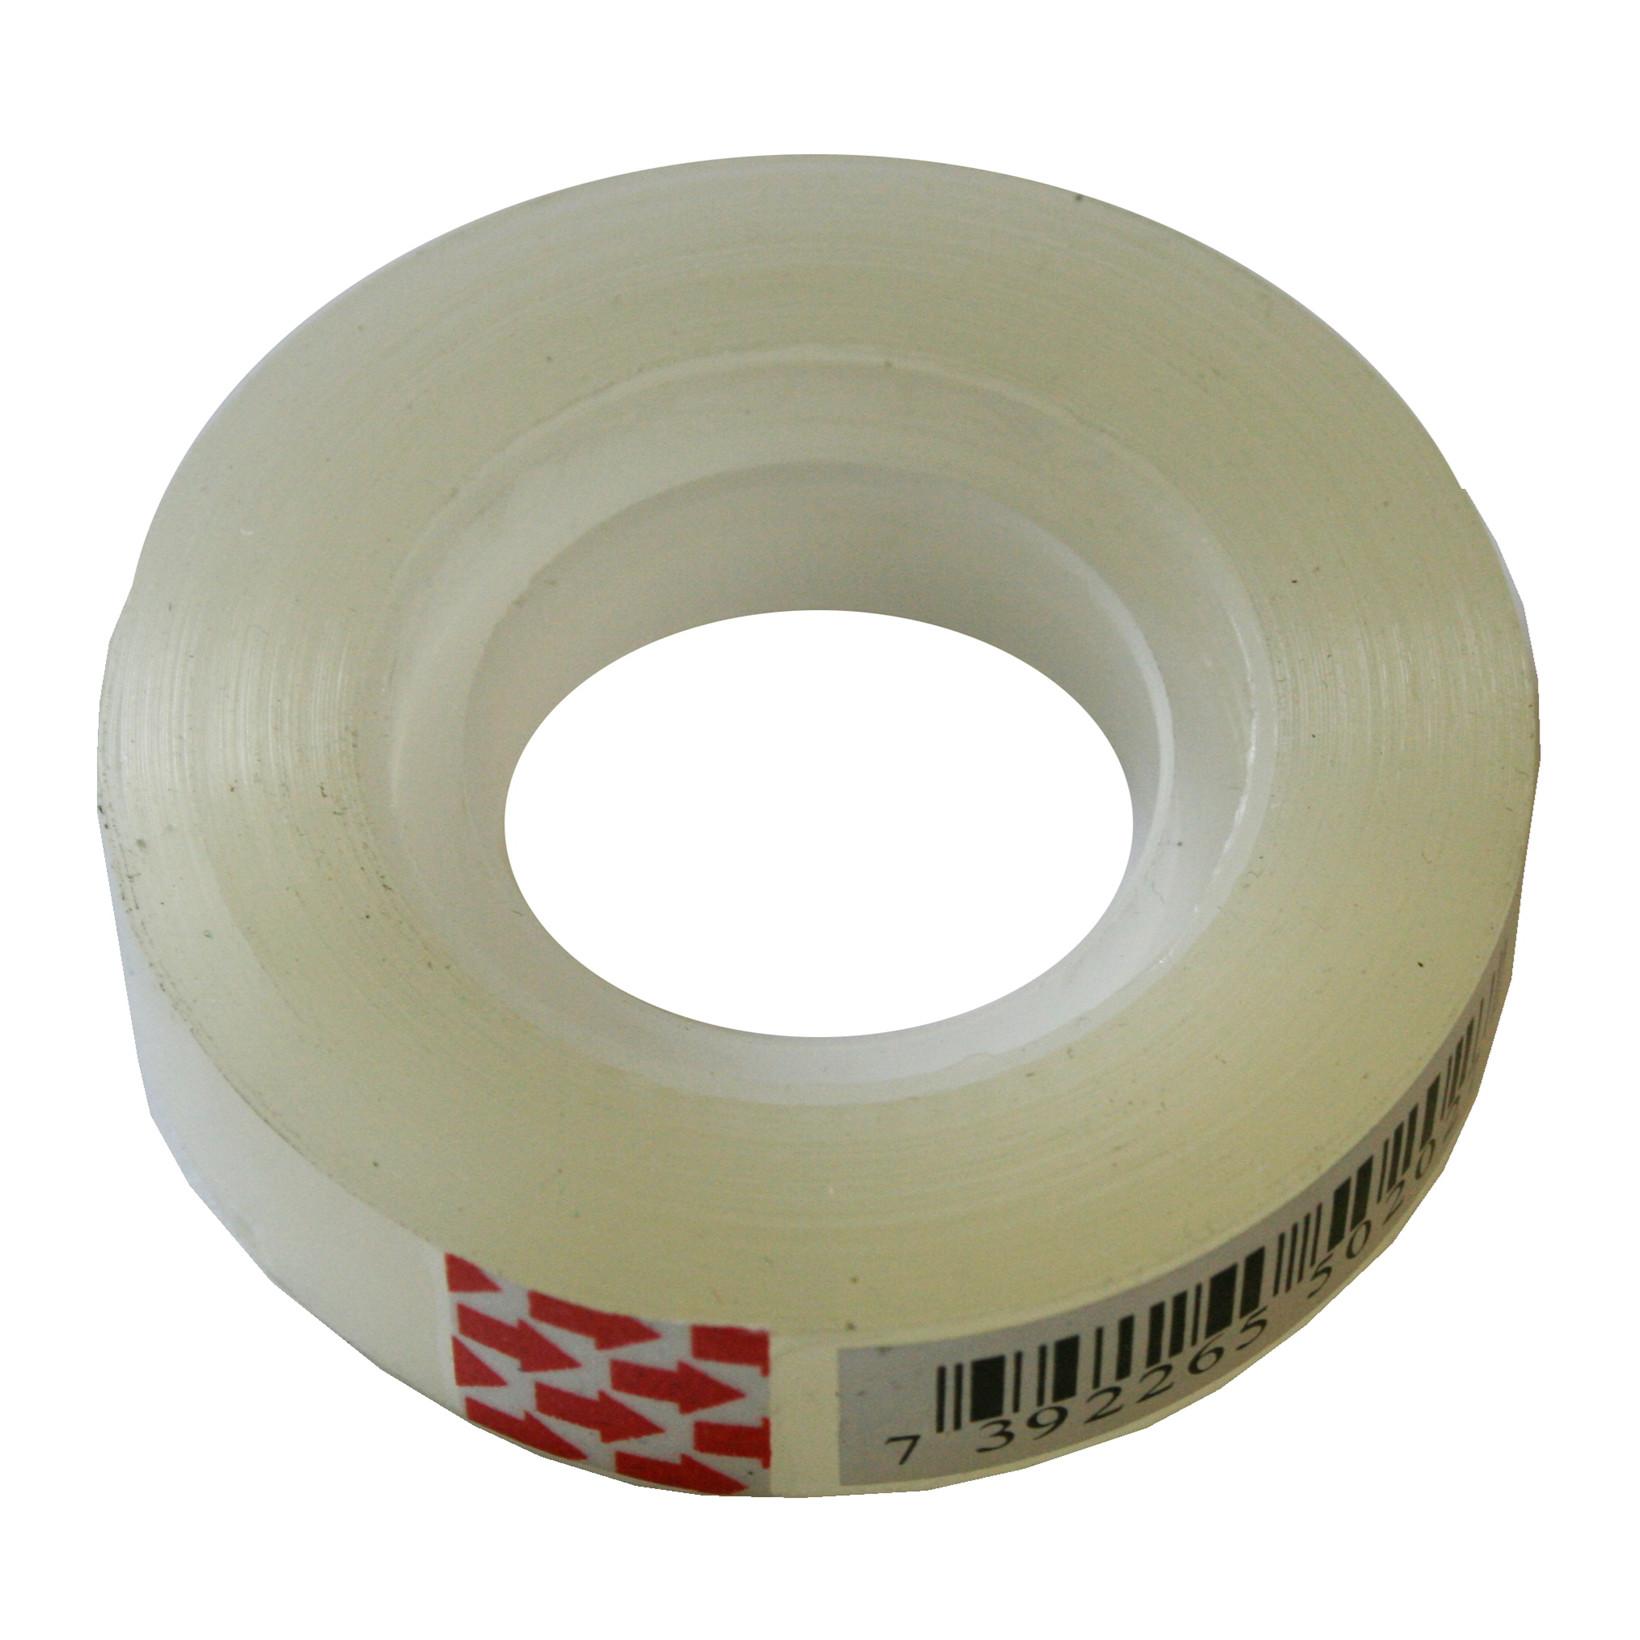 Tape BNT Office i klar - 12 mm x 33 meter